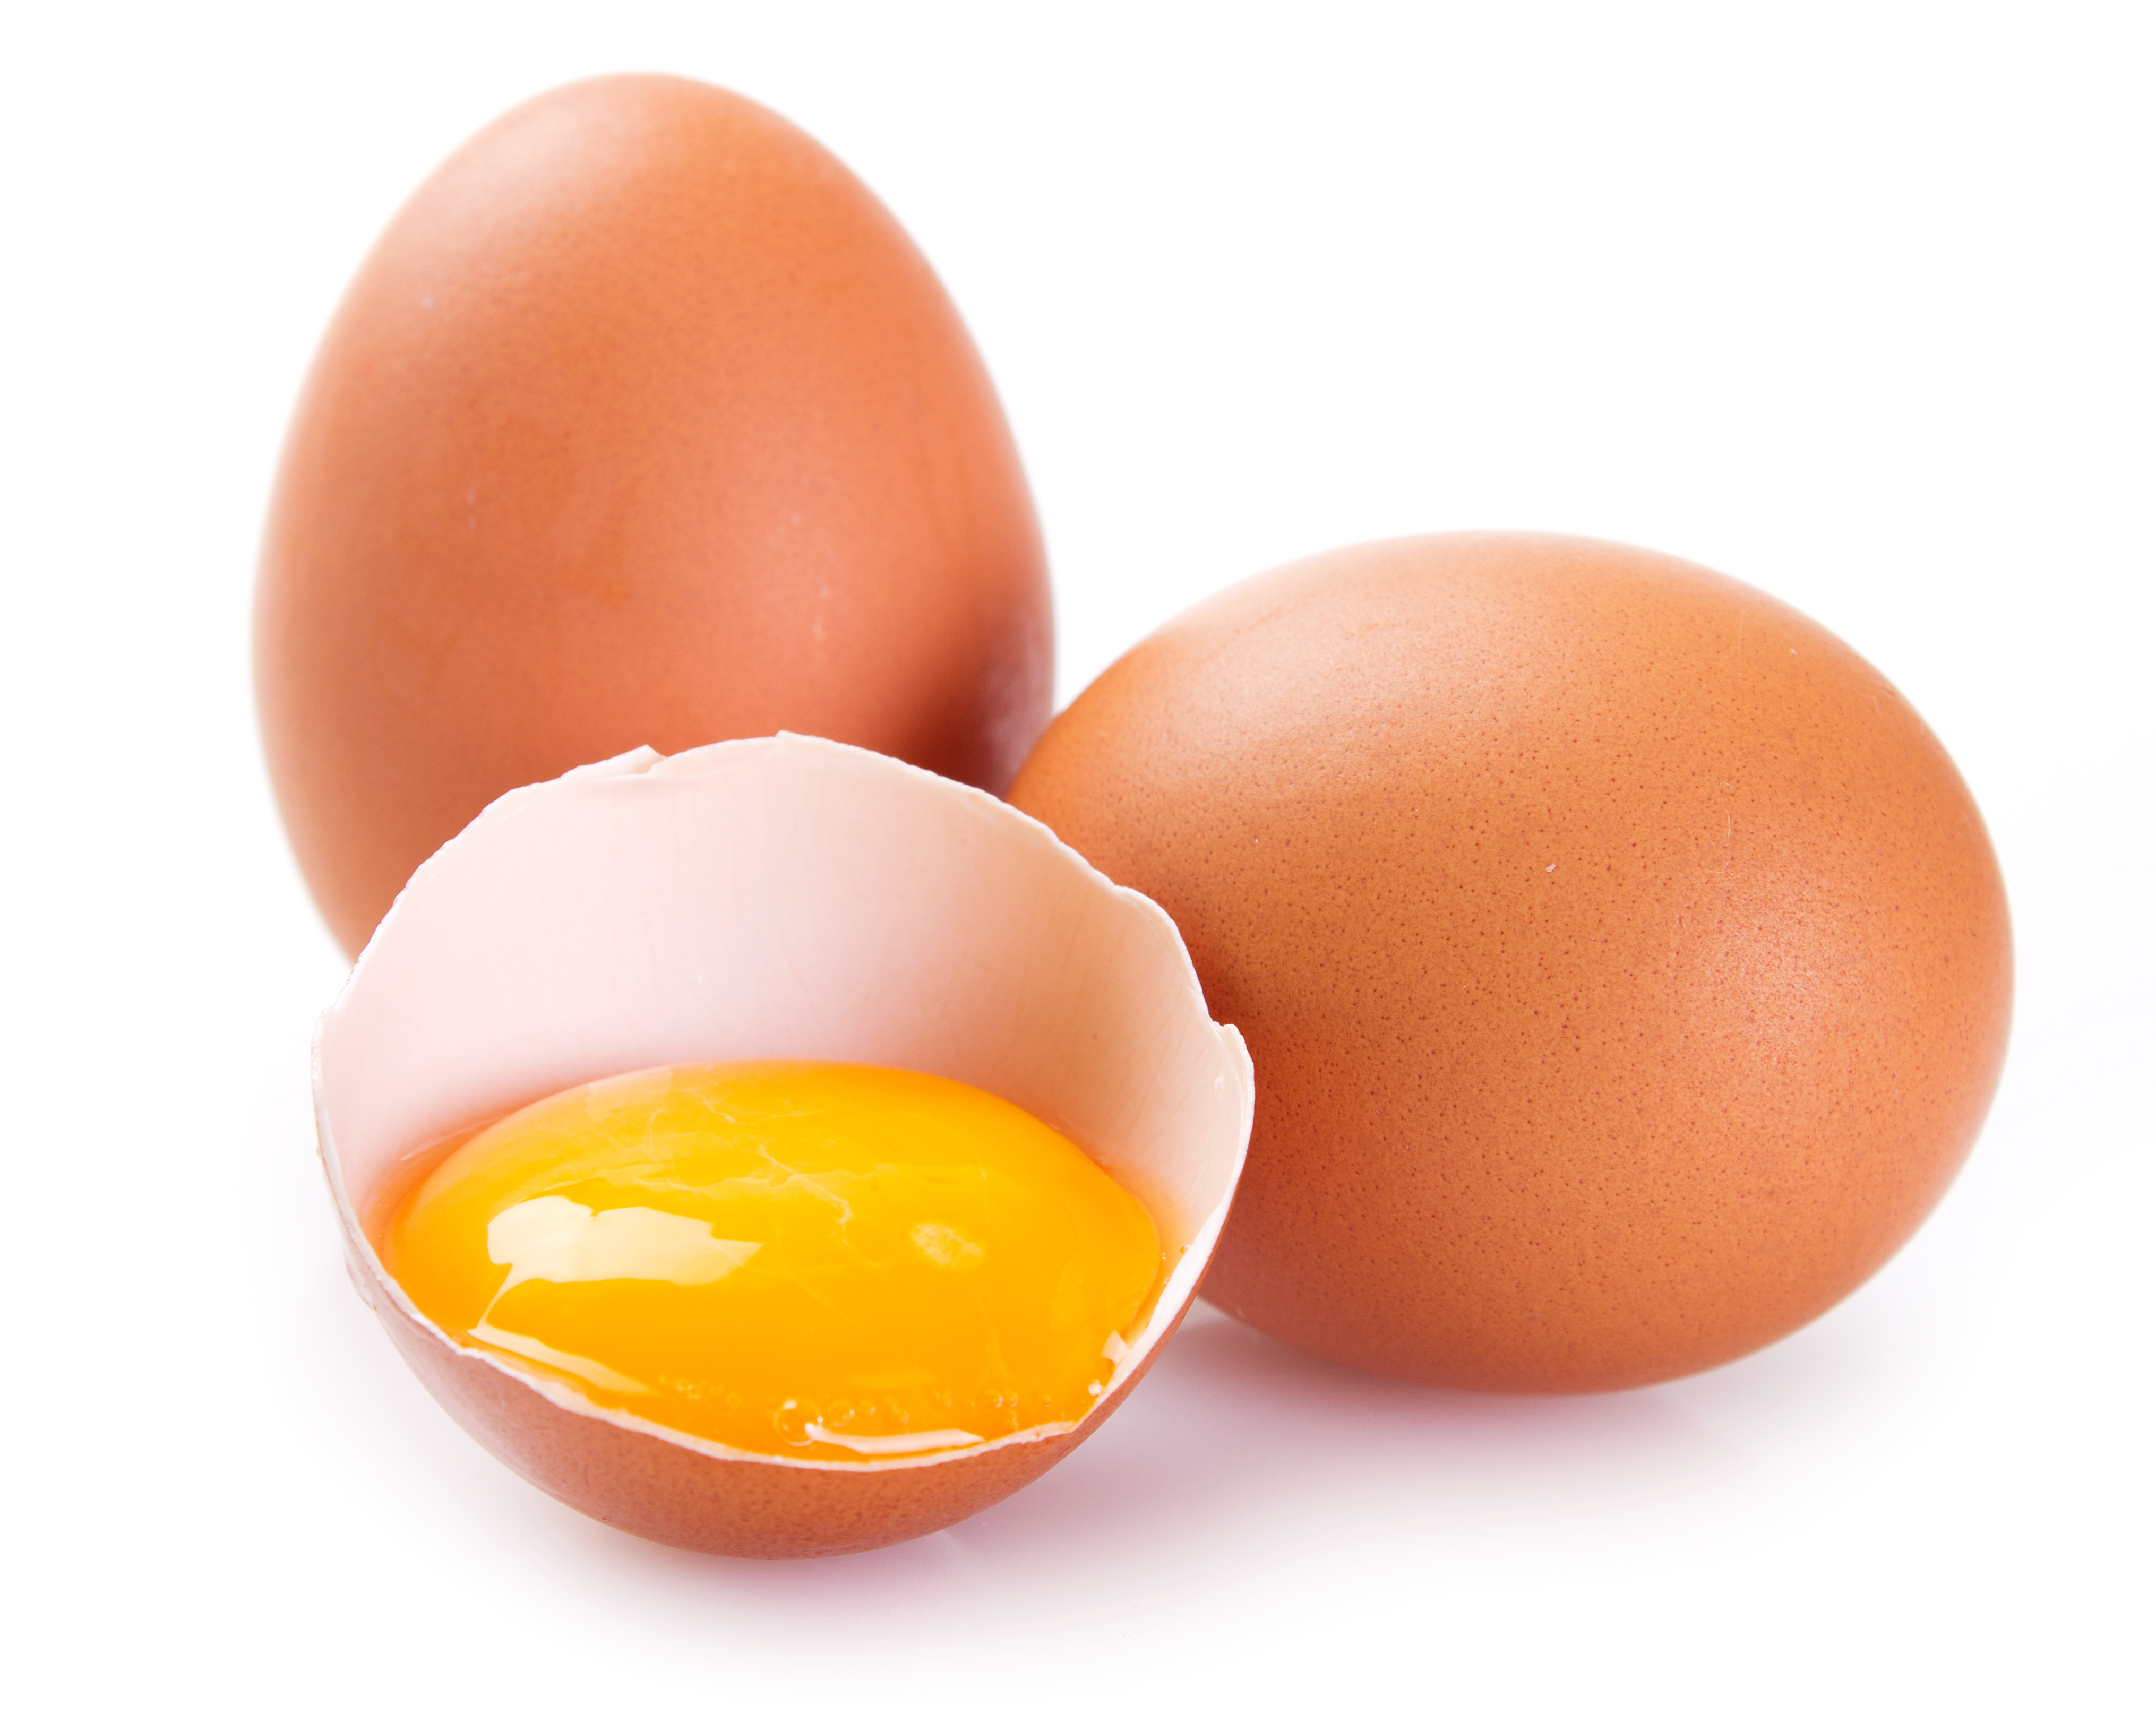 cholesterinhaltige lebensmittel